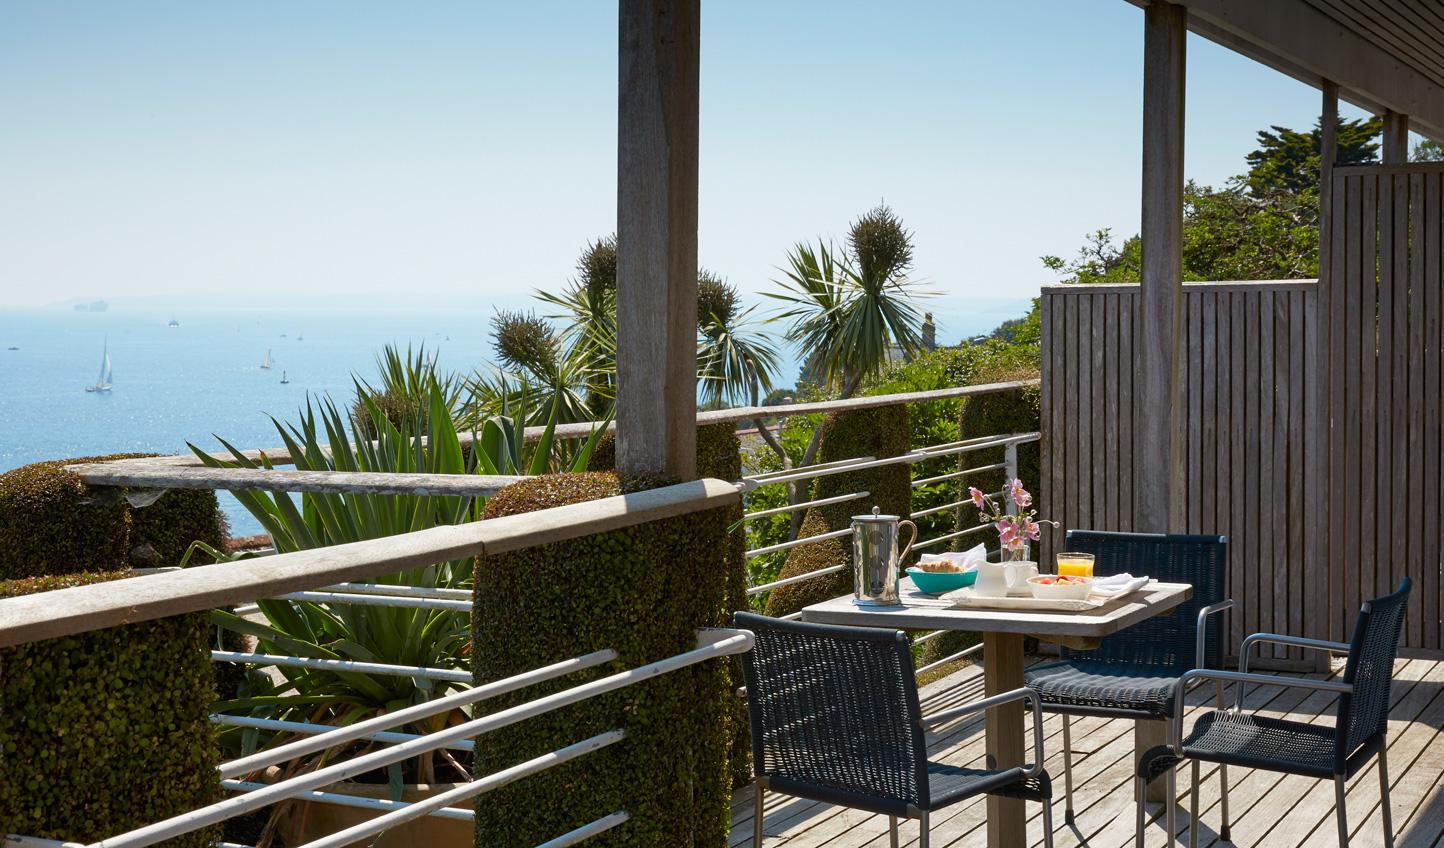 Enjoy breakfast al fresco with a view of the sea